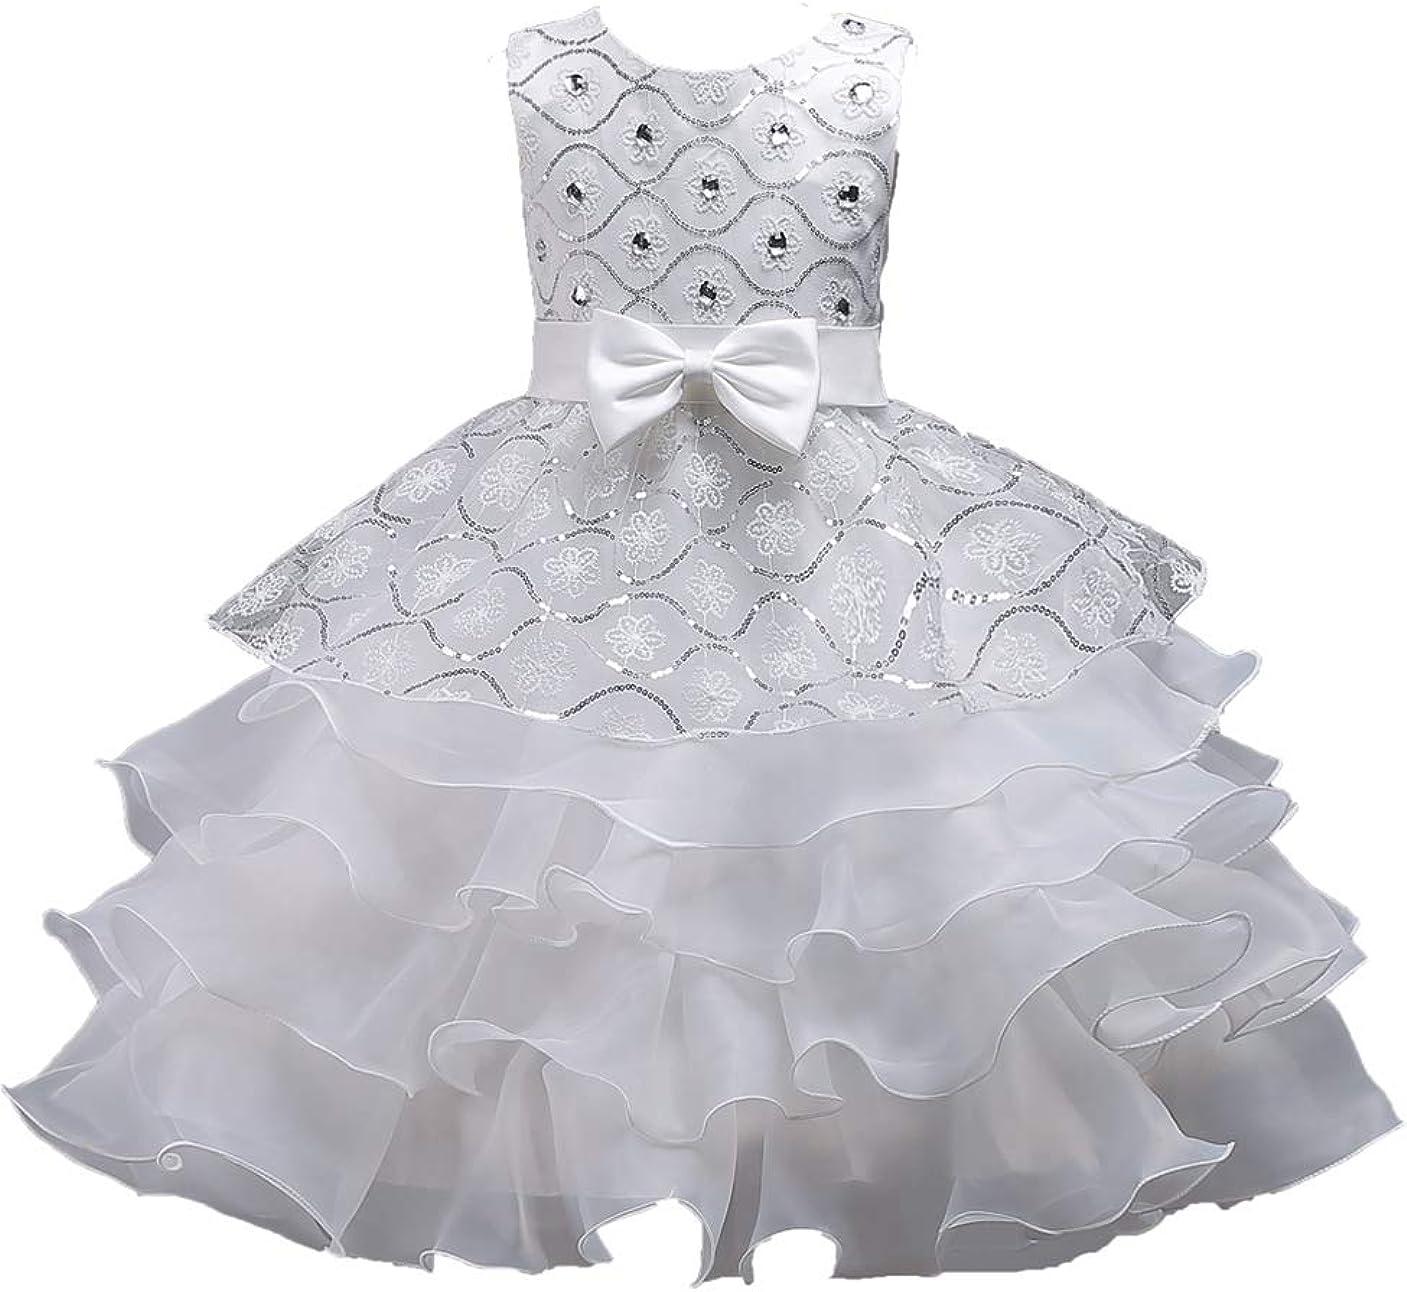 GRASWE Girls Ruffles Lace Party Dress Kids Flower Princess Wedding Dress